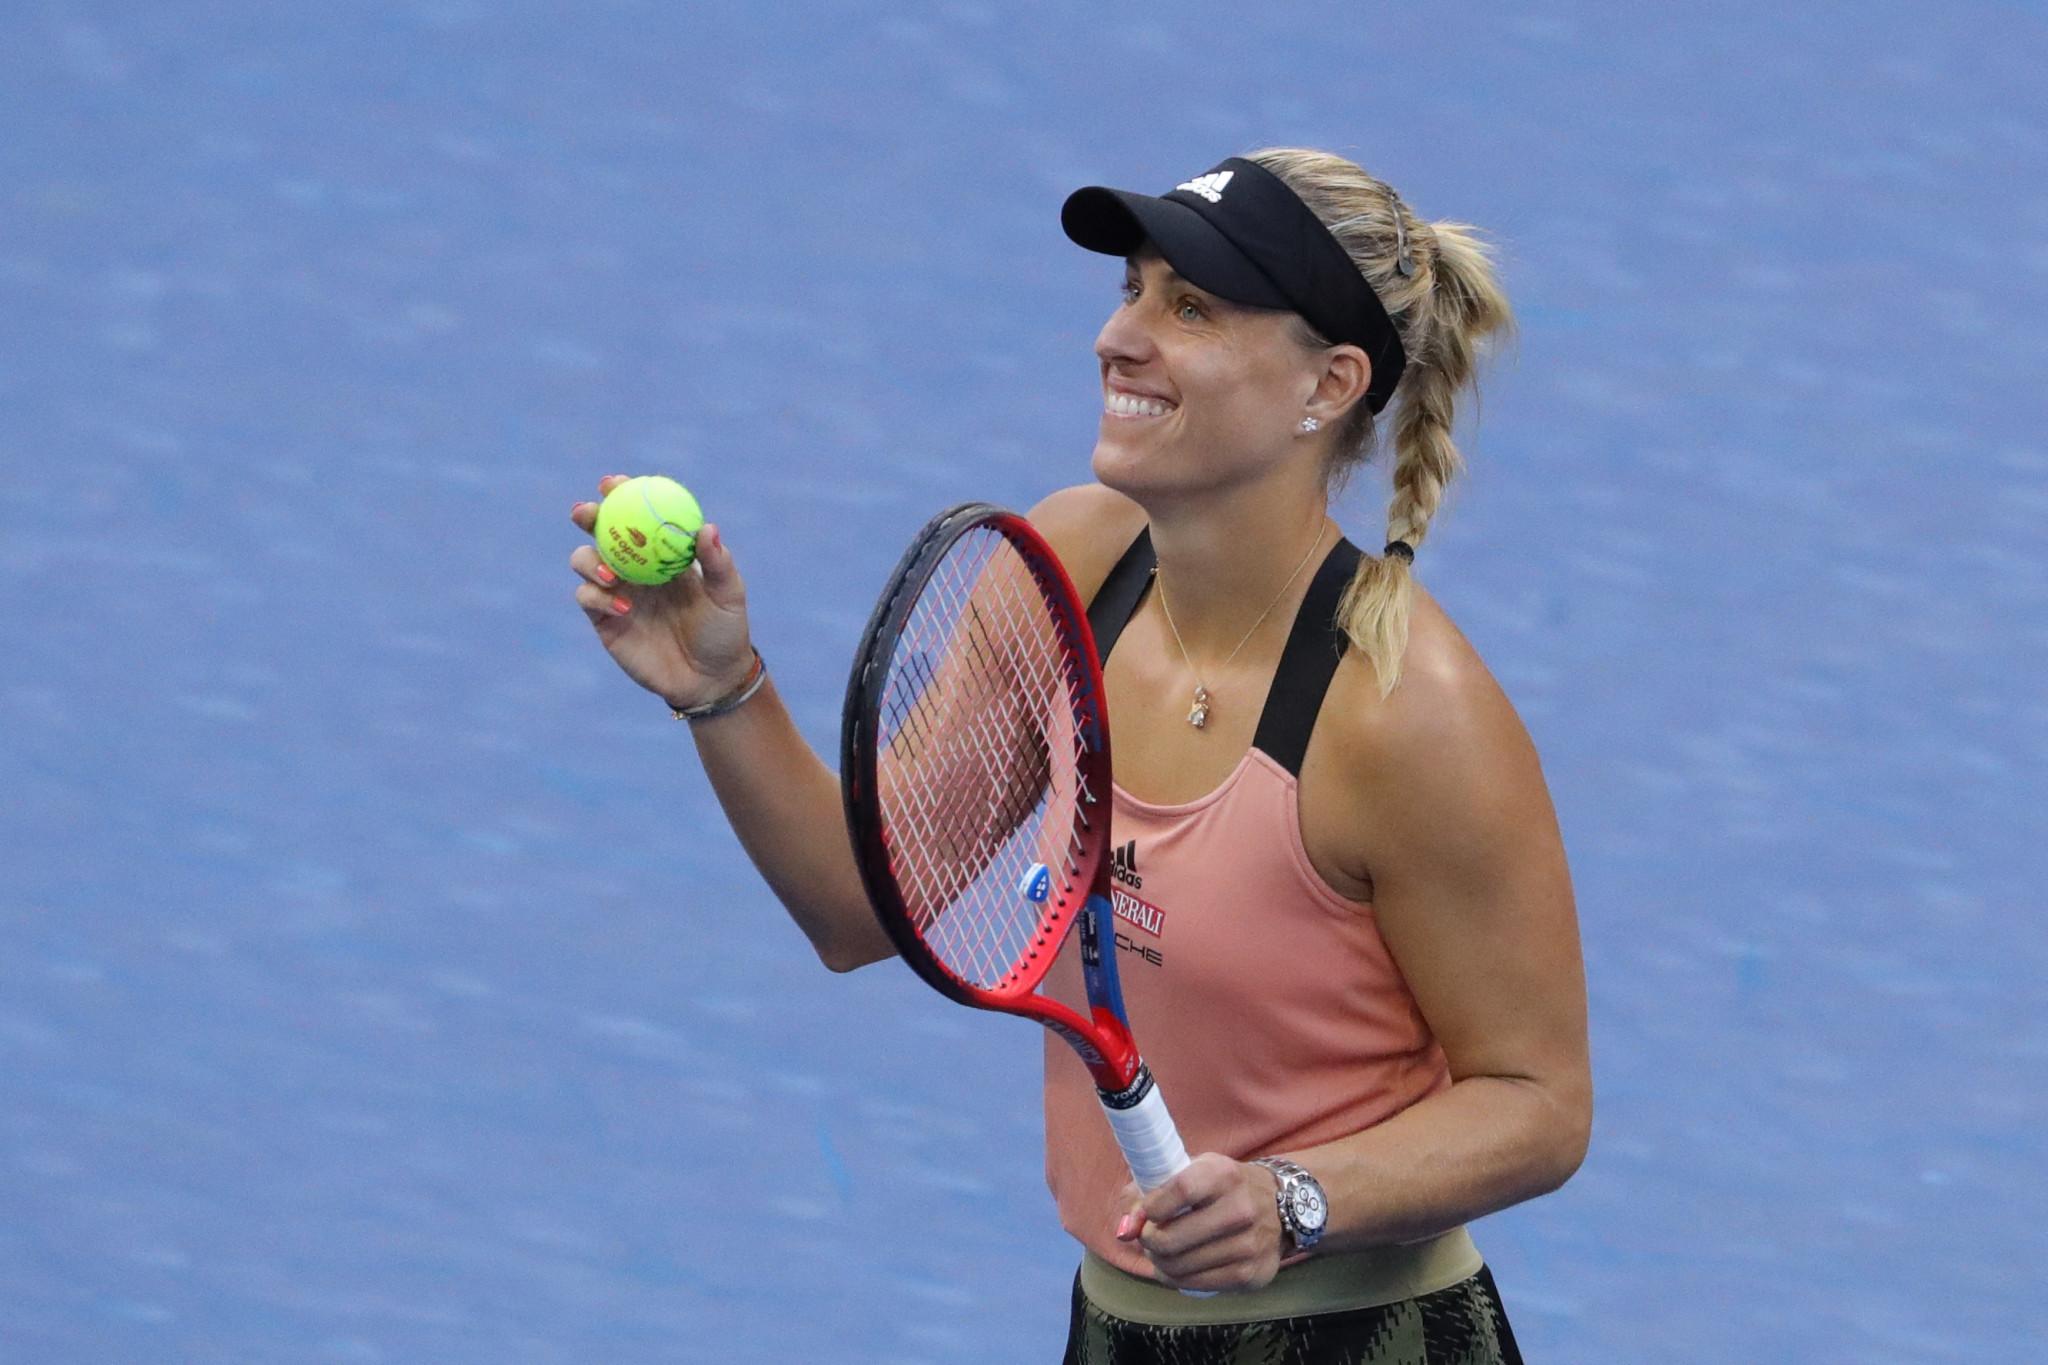 US Open 2021: Angelique Kerber vs Leylah Fernandez Tennis Pick and Prediction